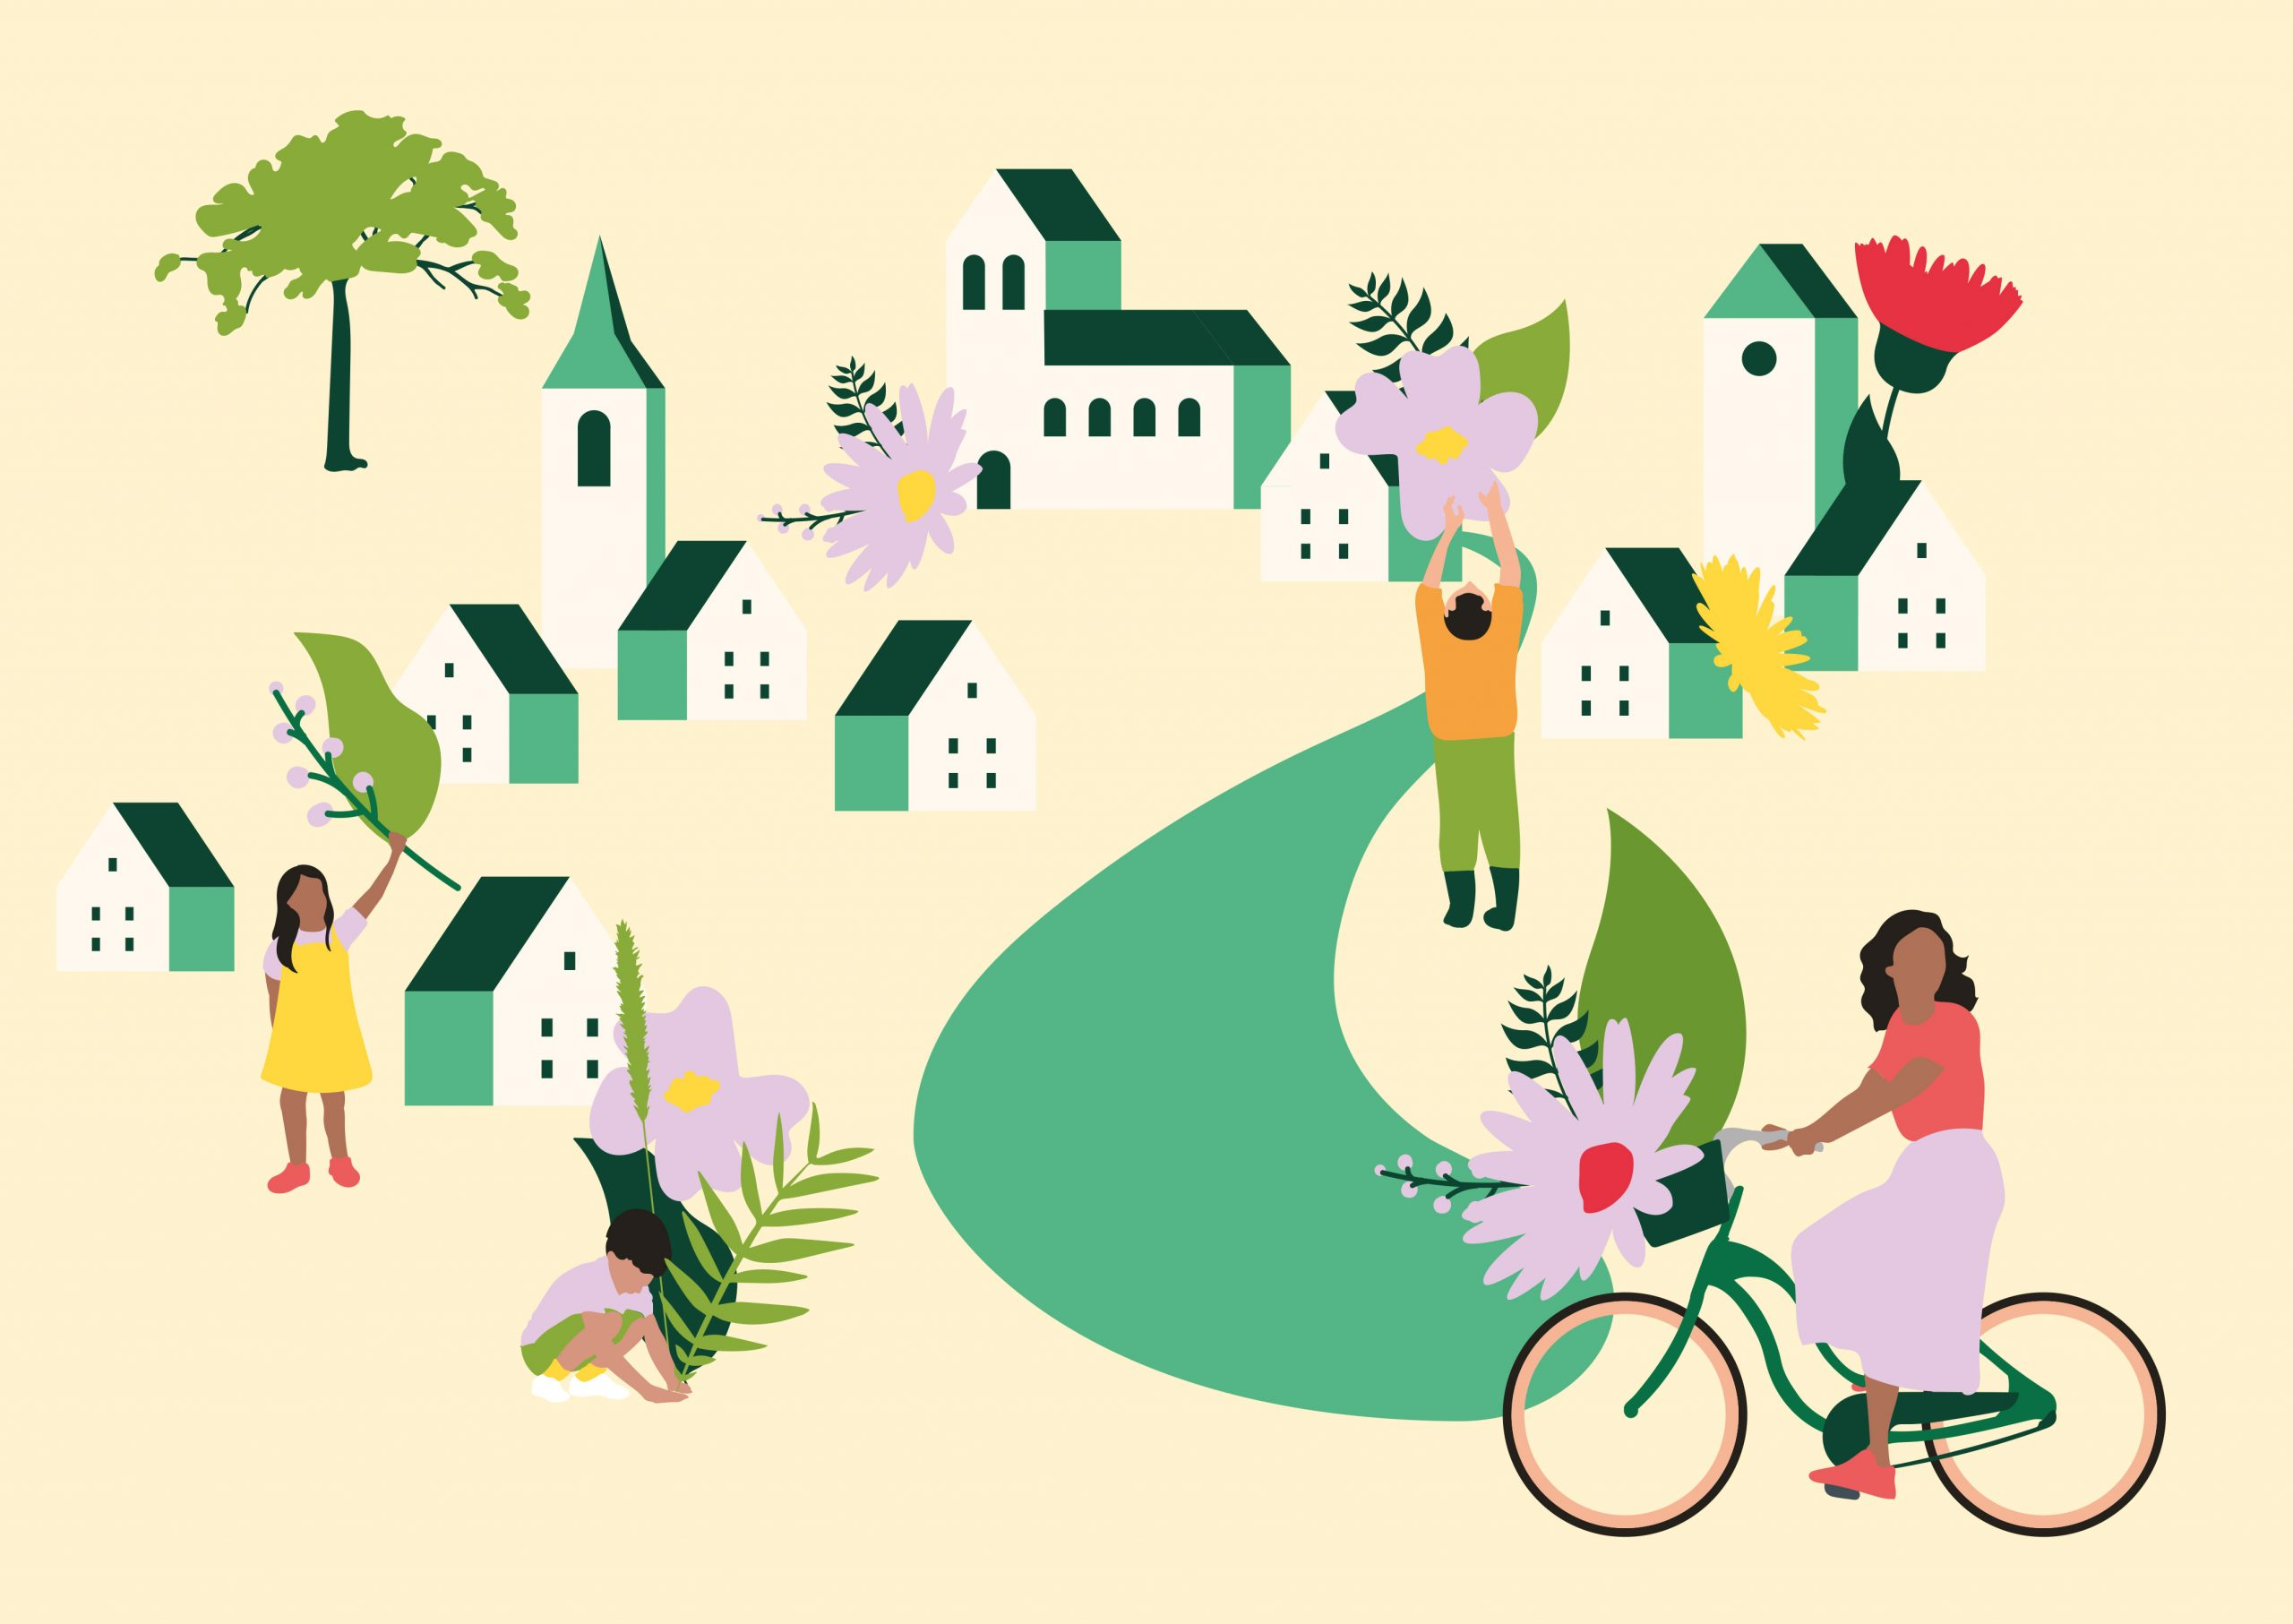 CNVVF villes villages fleuris illustration